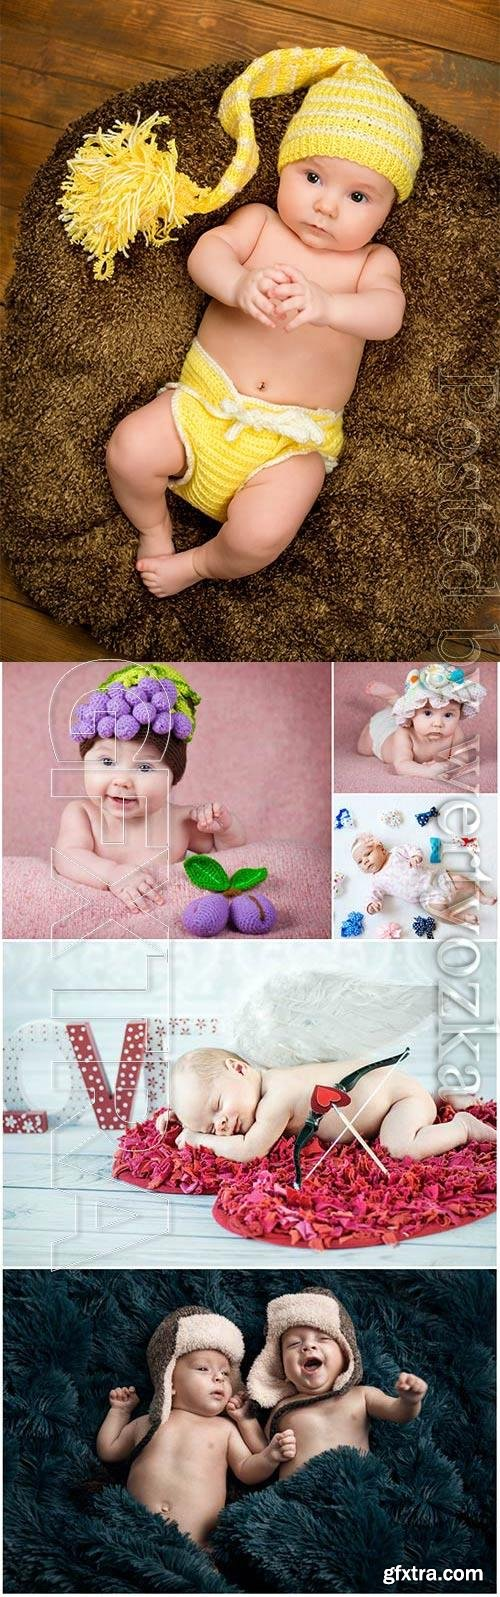 Cute little kids in funny hats stock photo